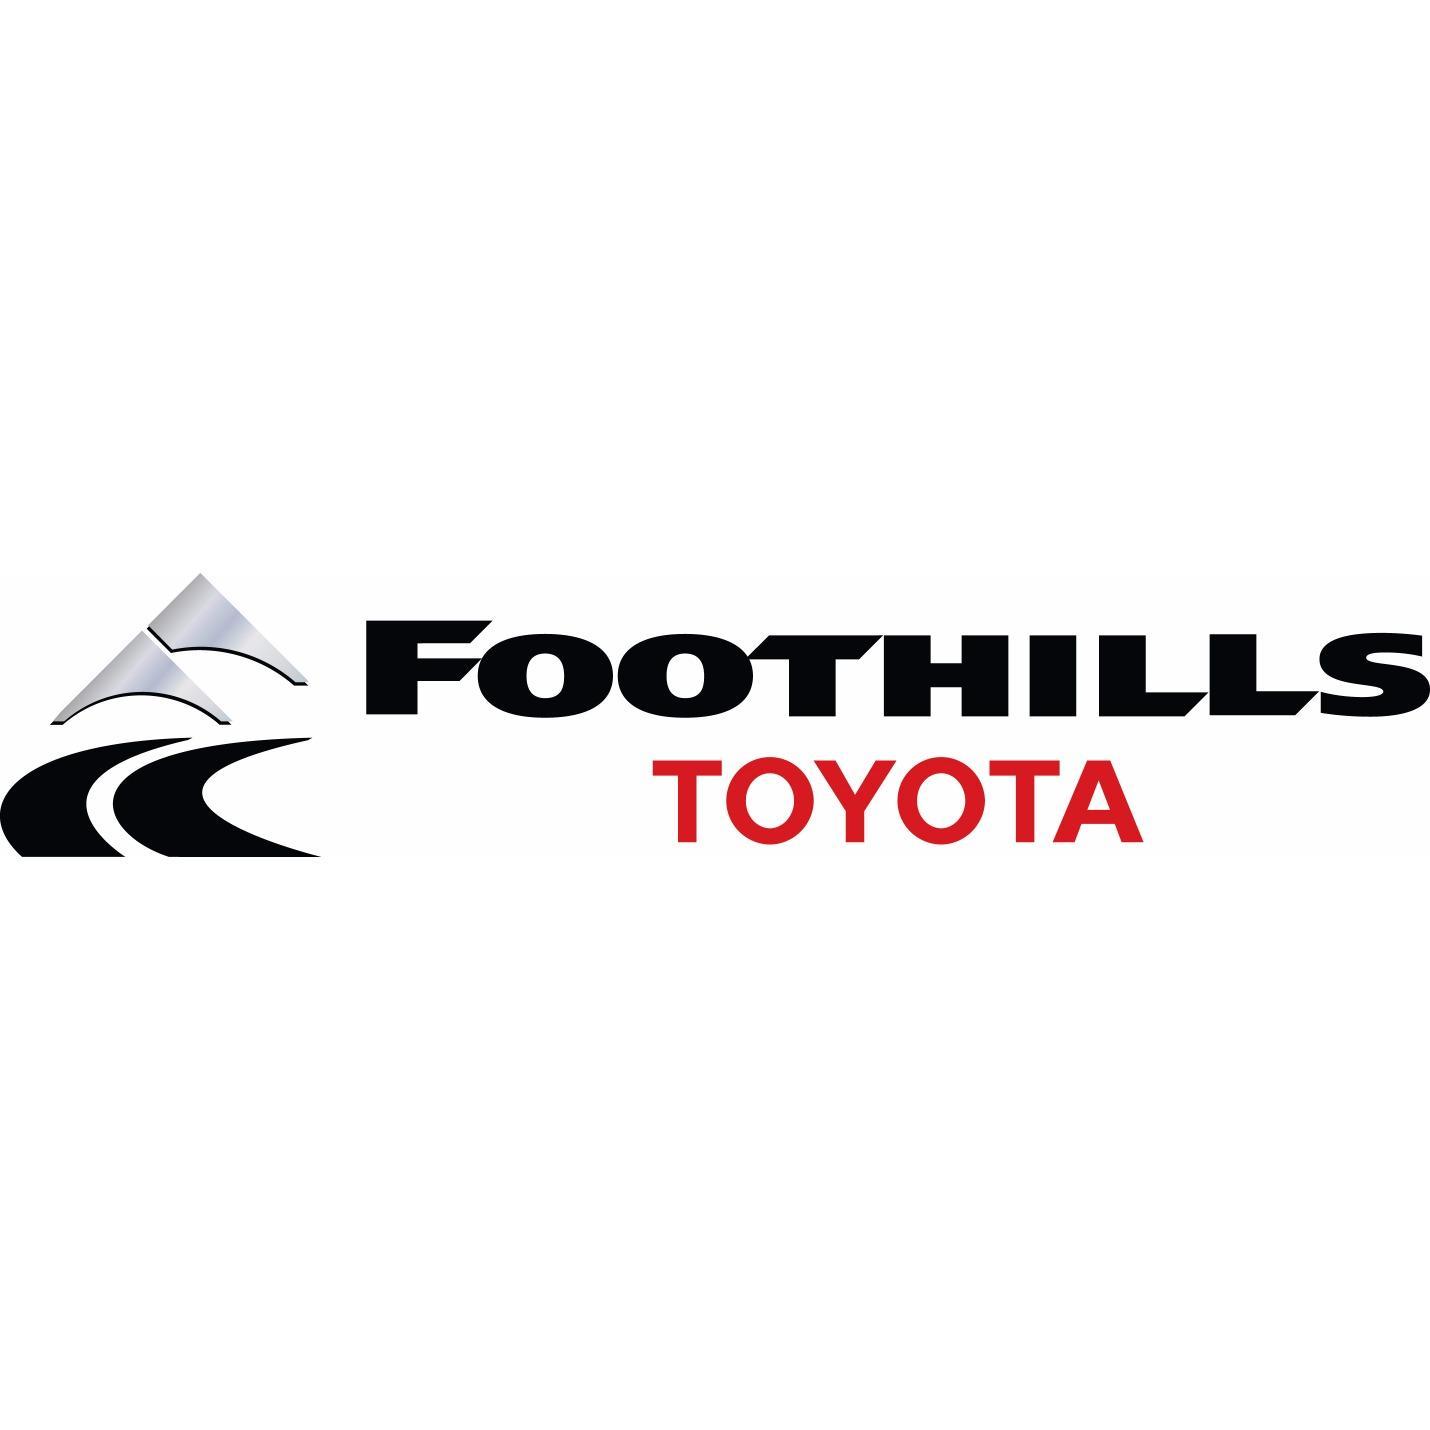 Foothills Toyota